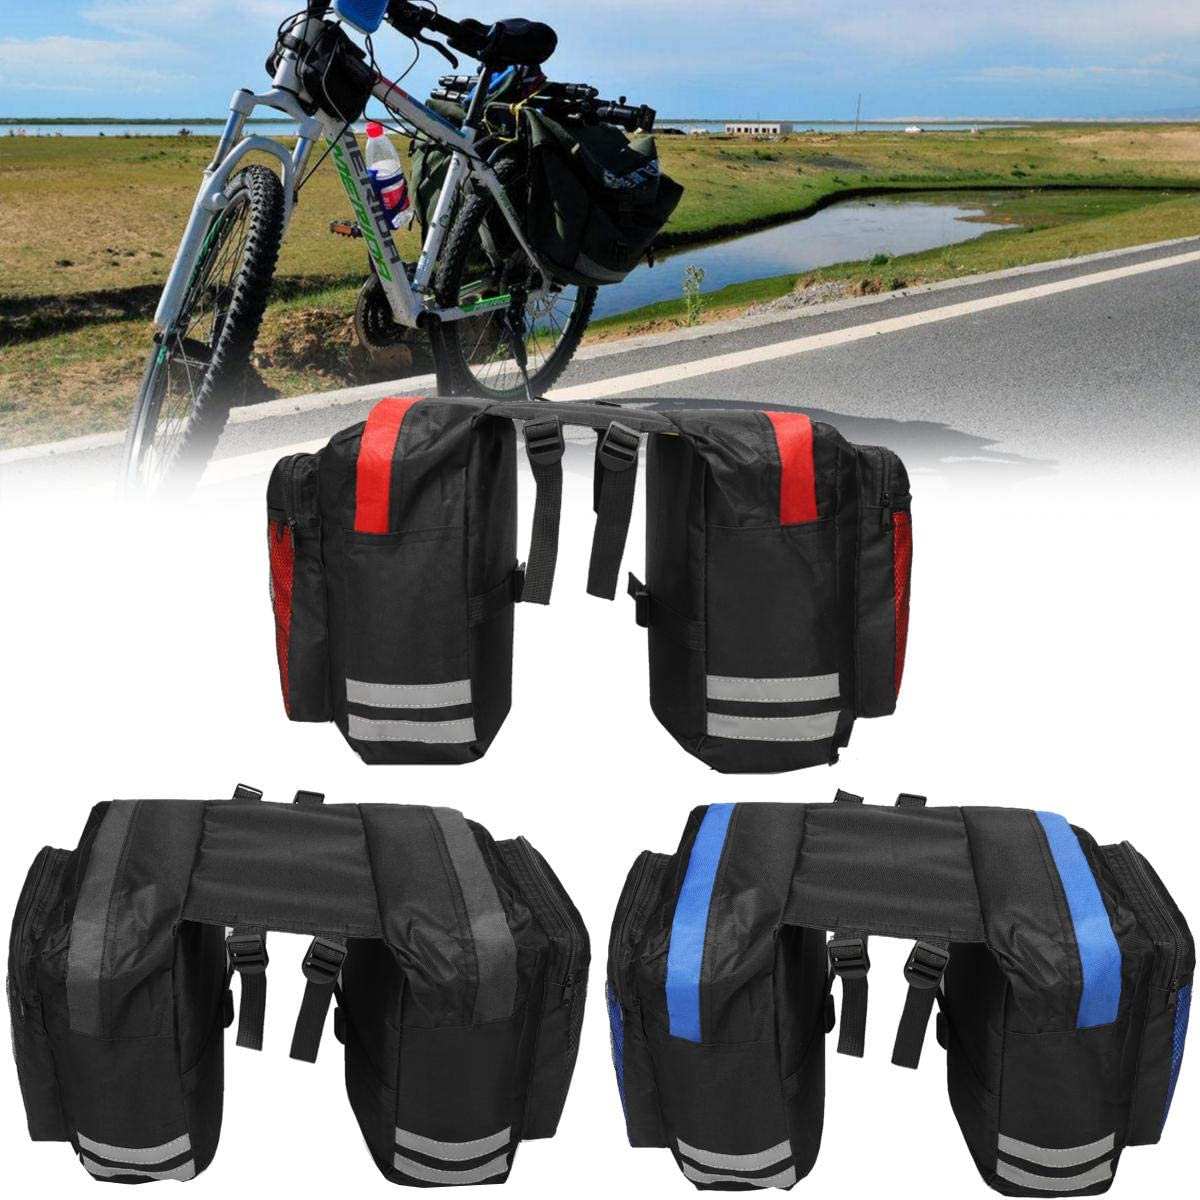 600D 20L Bicycle Rear Rack Seat Saddle Bag Travel Cycling Bike U ~US